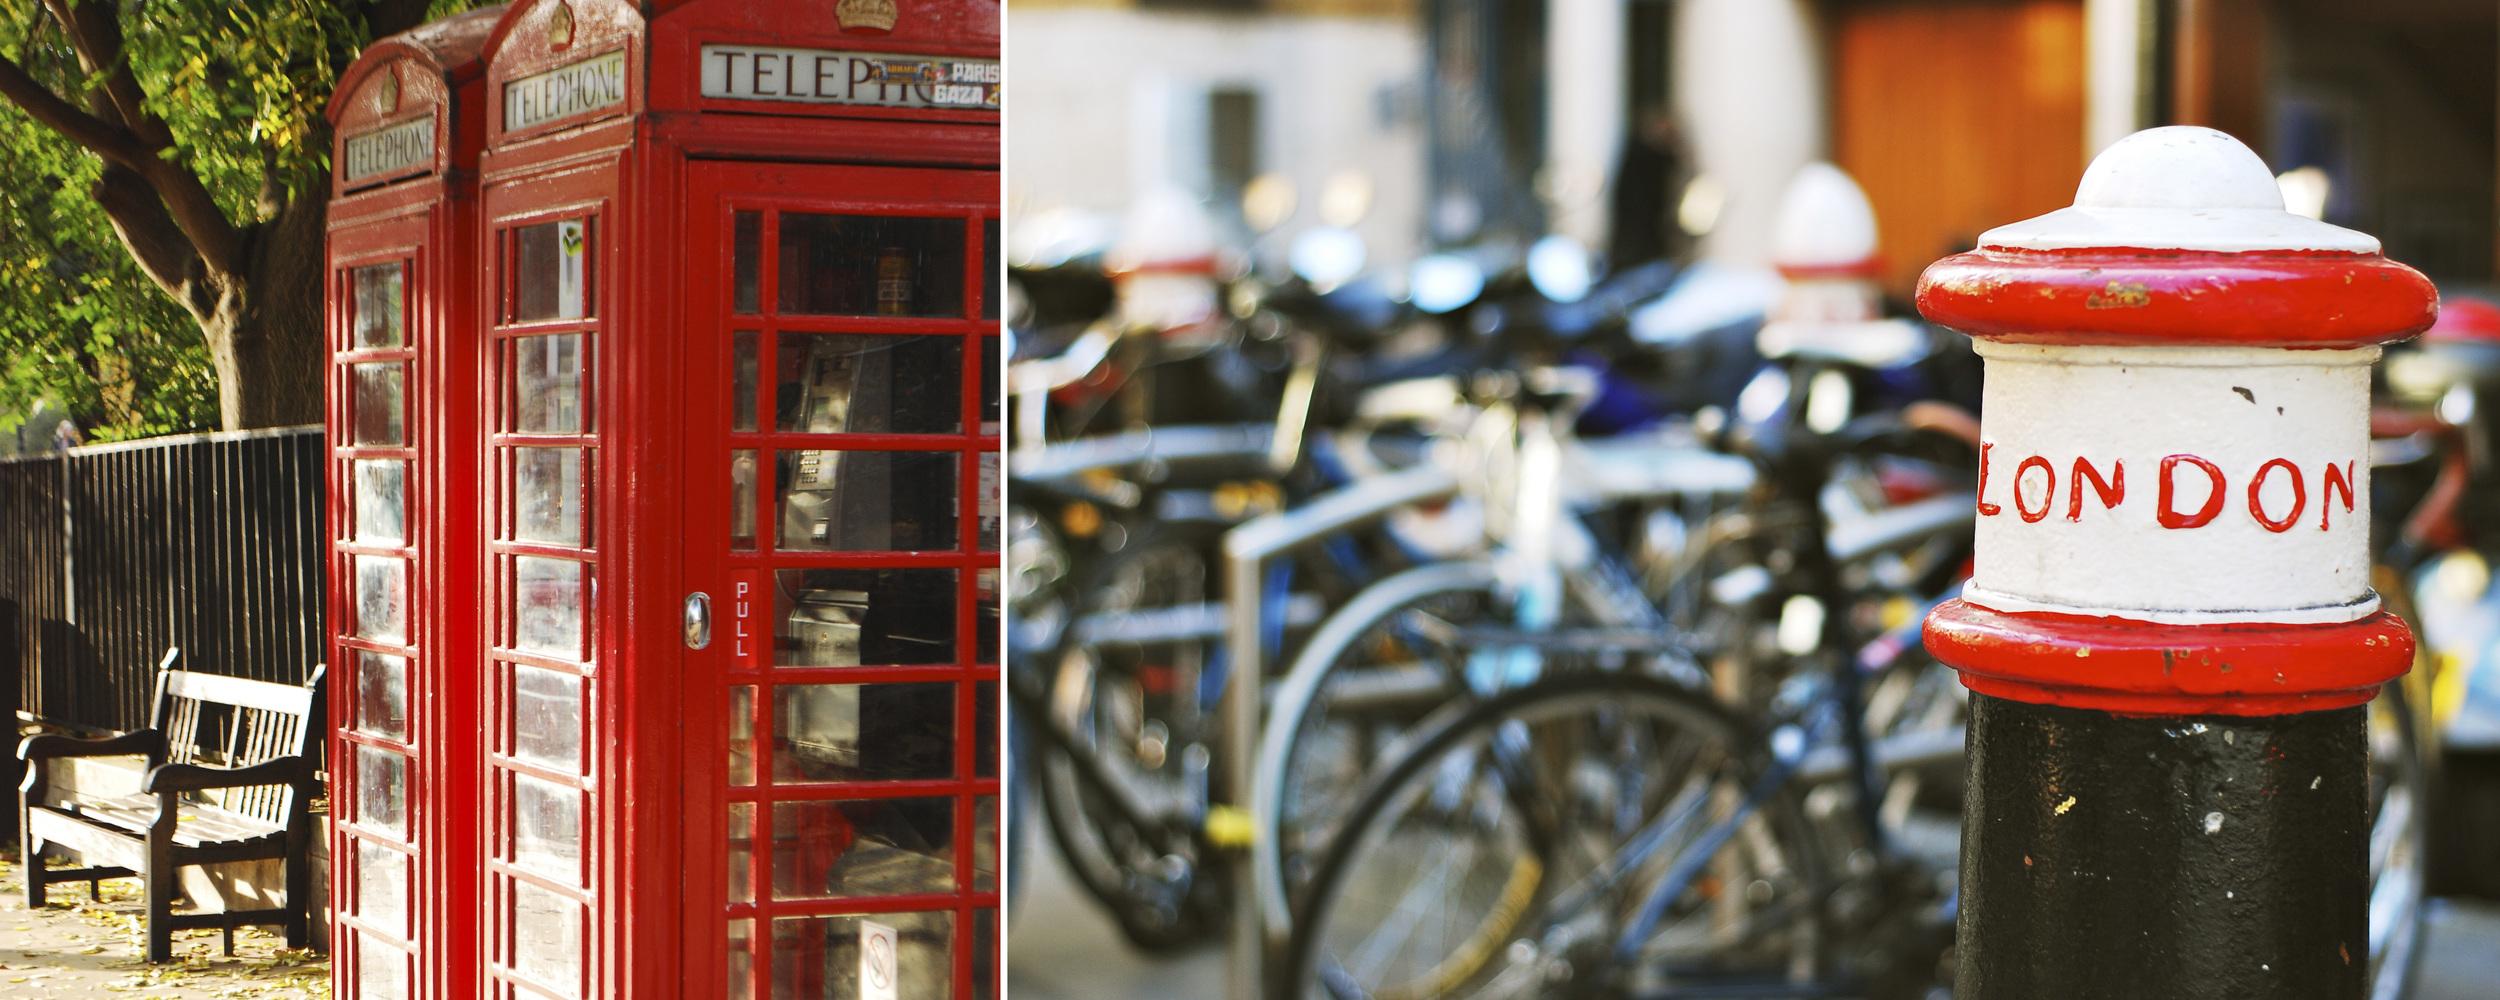 Londres London